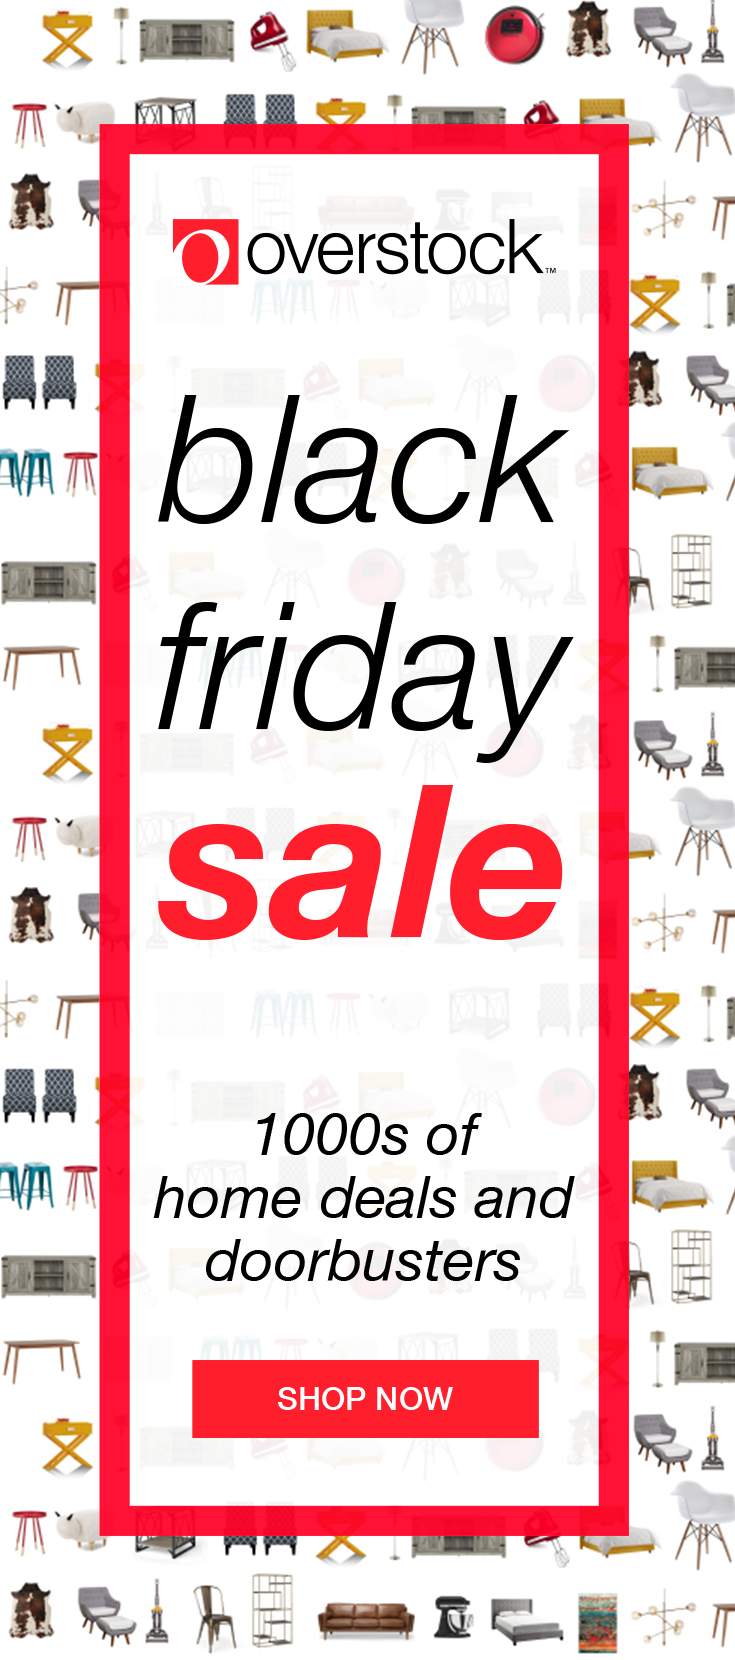 Black Friday Online Deals 2019 Overstock Com The Best Black